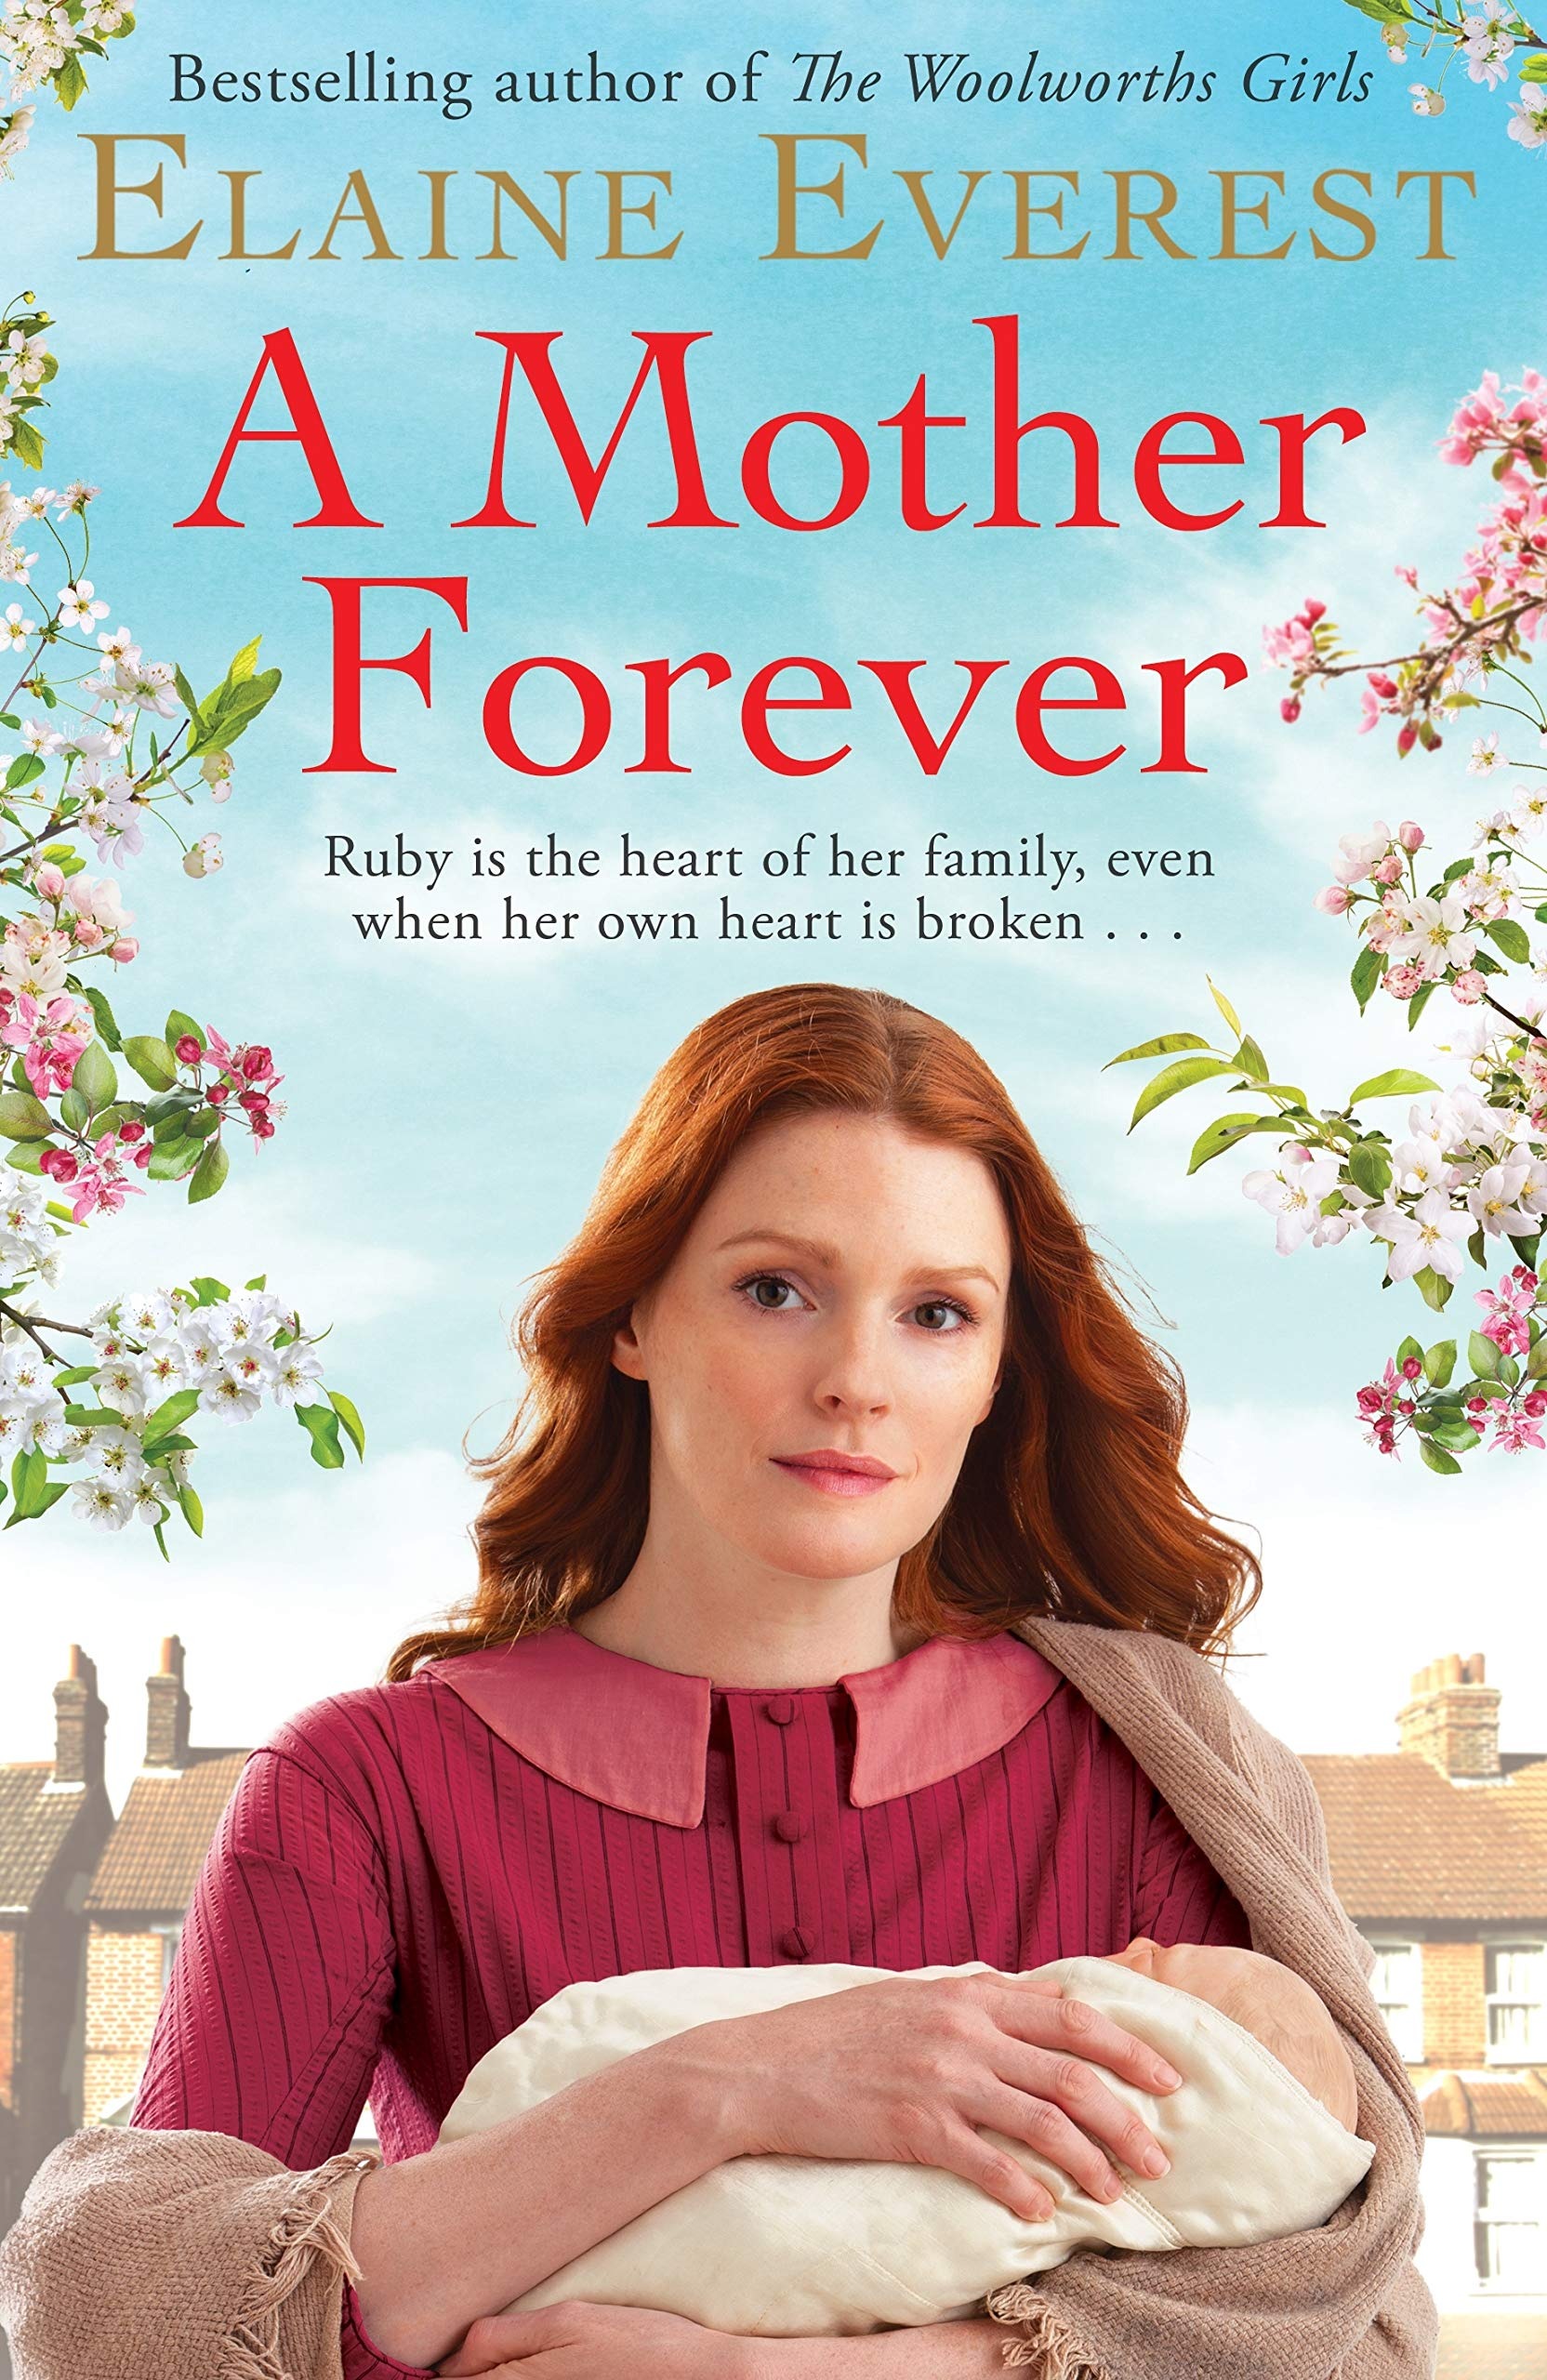 A Mother Forever: Amazon.co.uk: Everest, Elaine: 9781529015997: Books